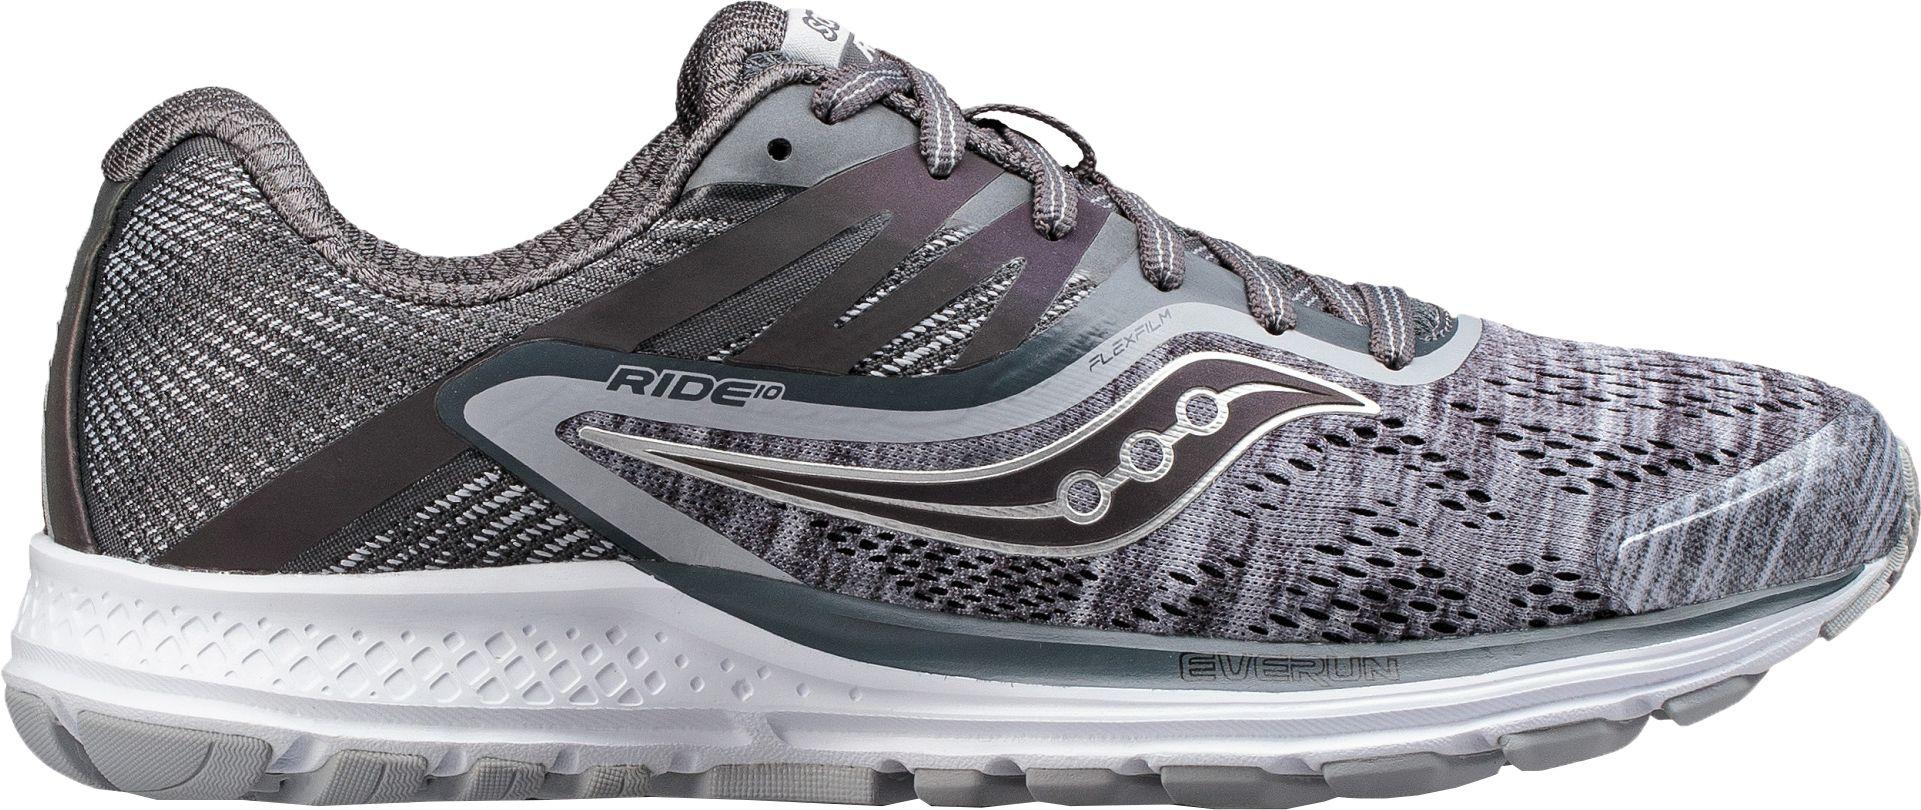 Saucony Women S Ride 10 Running Shoes